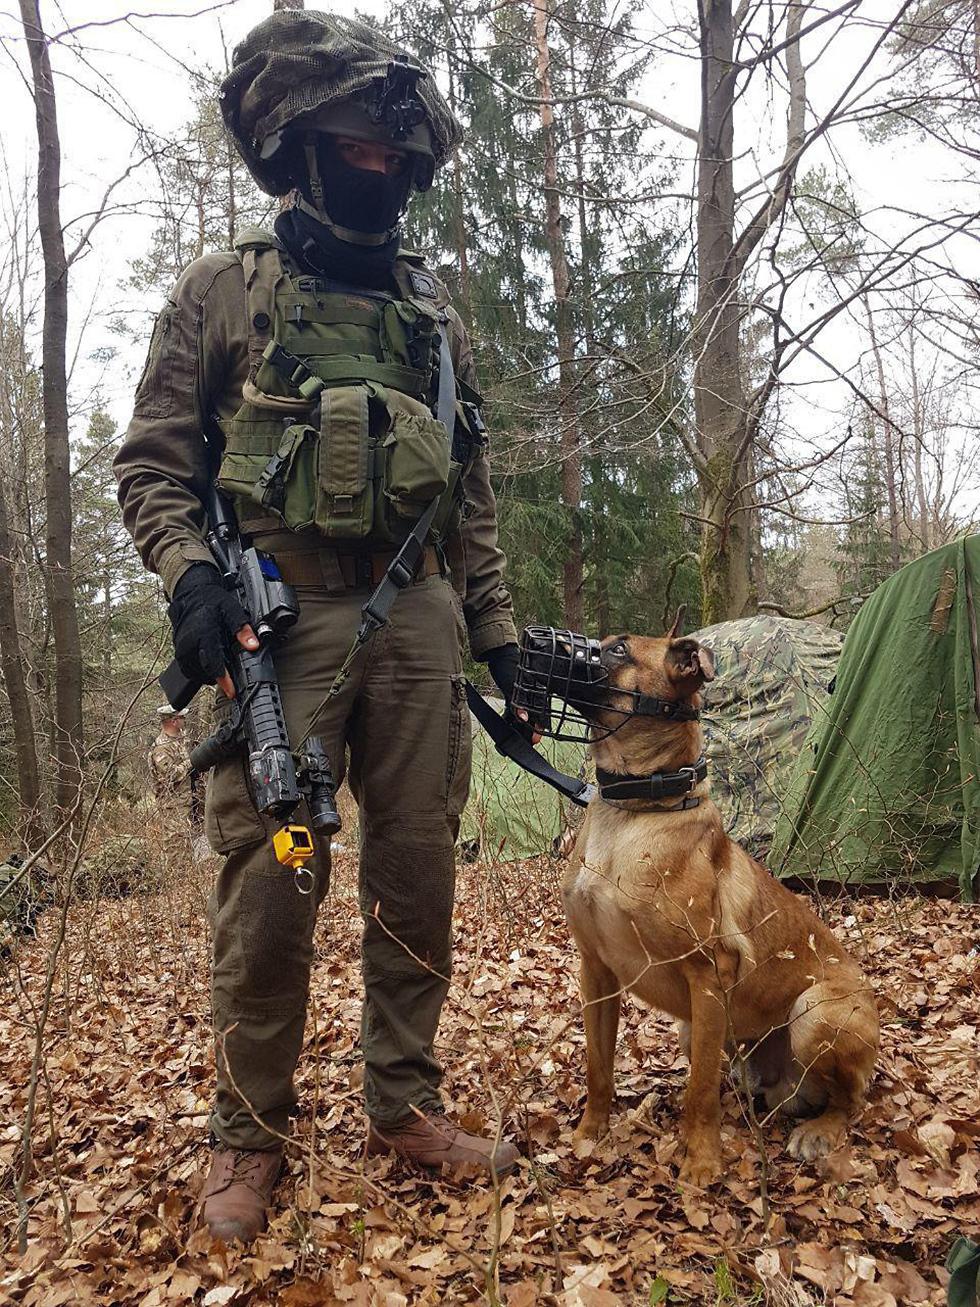 A canine unit